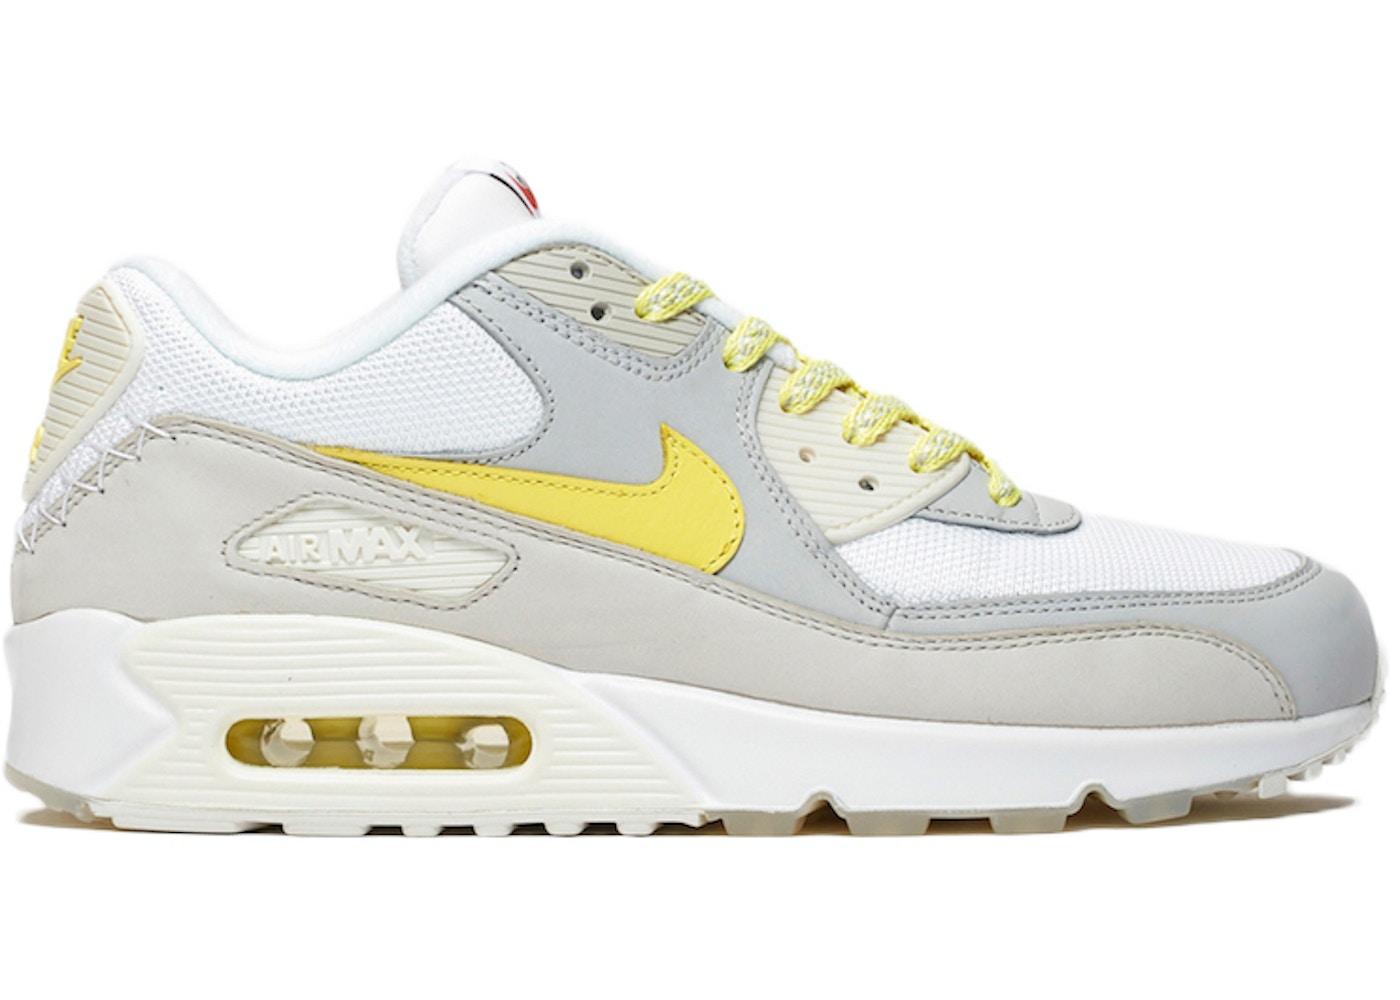 c32fff73 Buy Nike Air Max 90 Shoes & Deadstock Sneakers